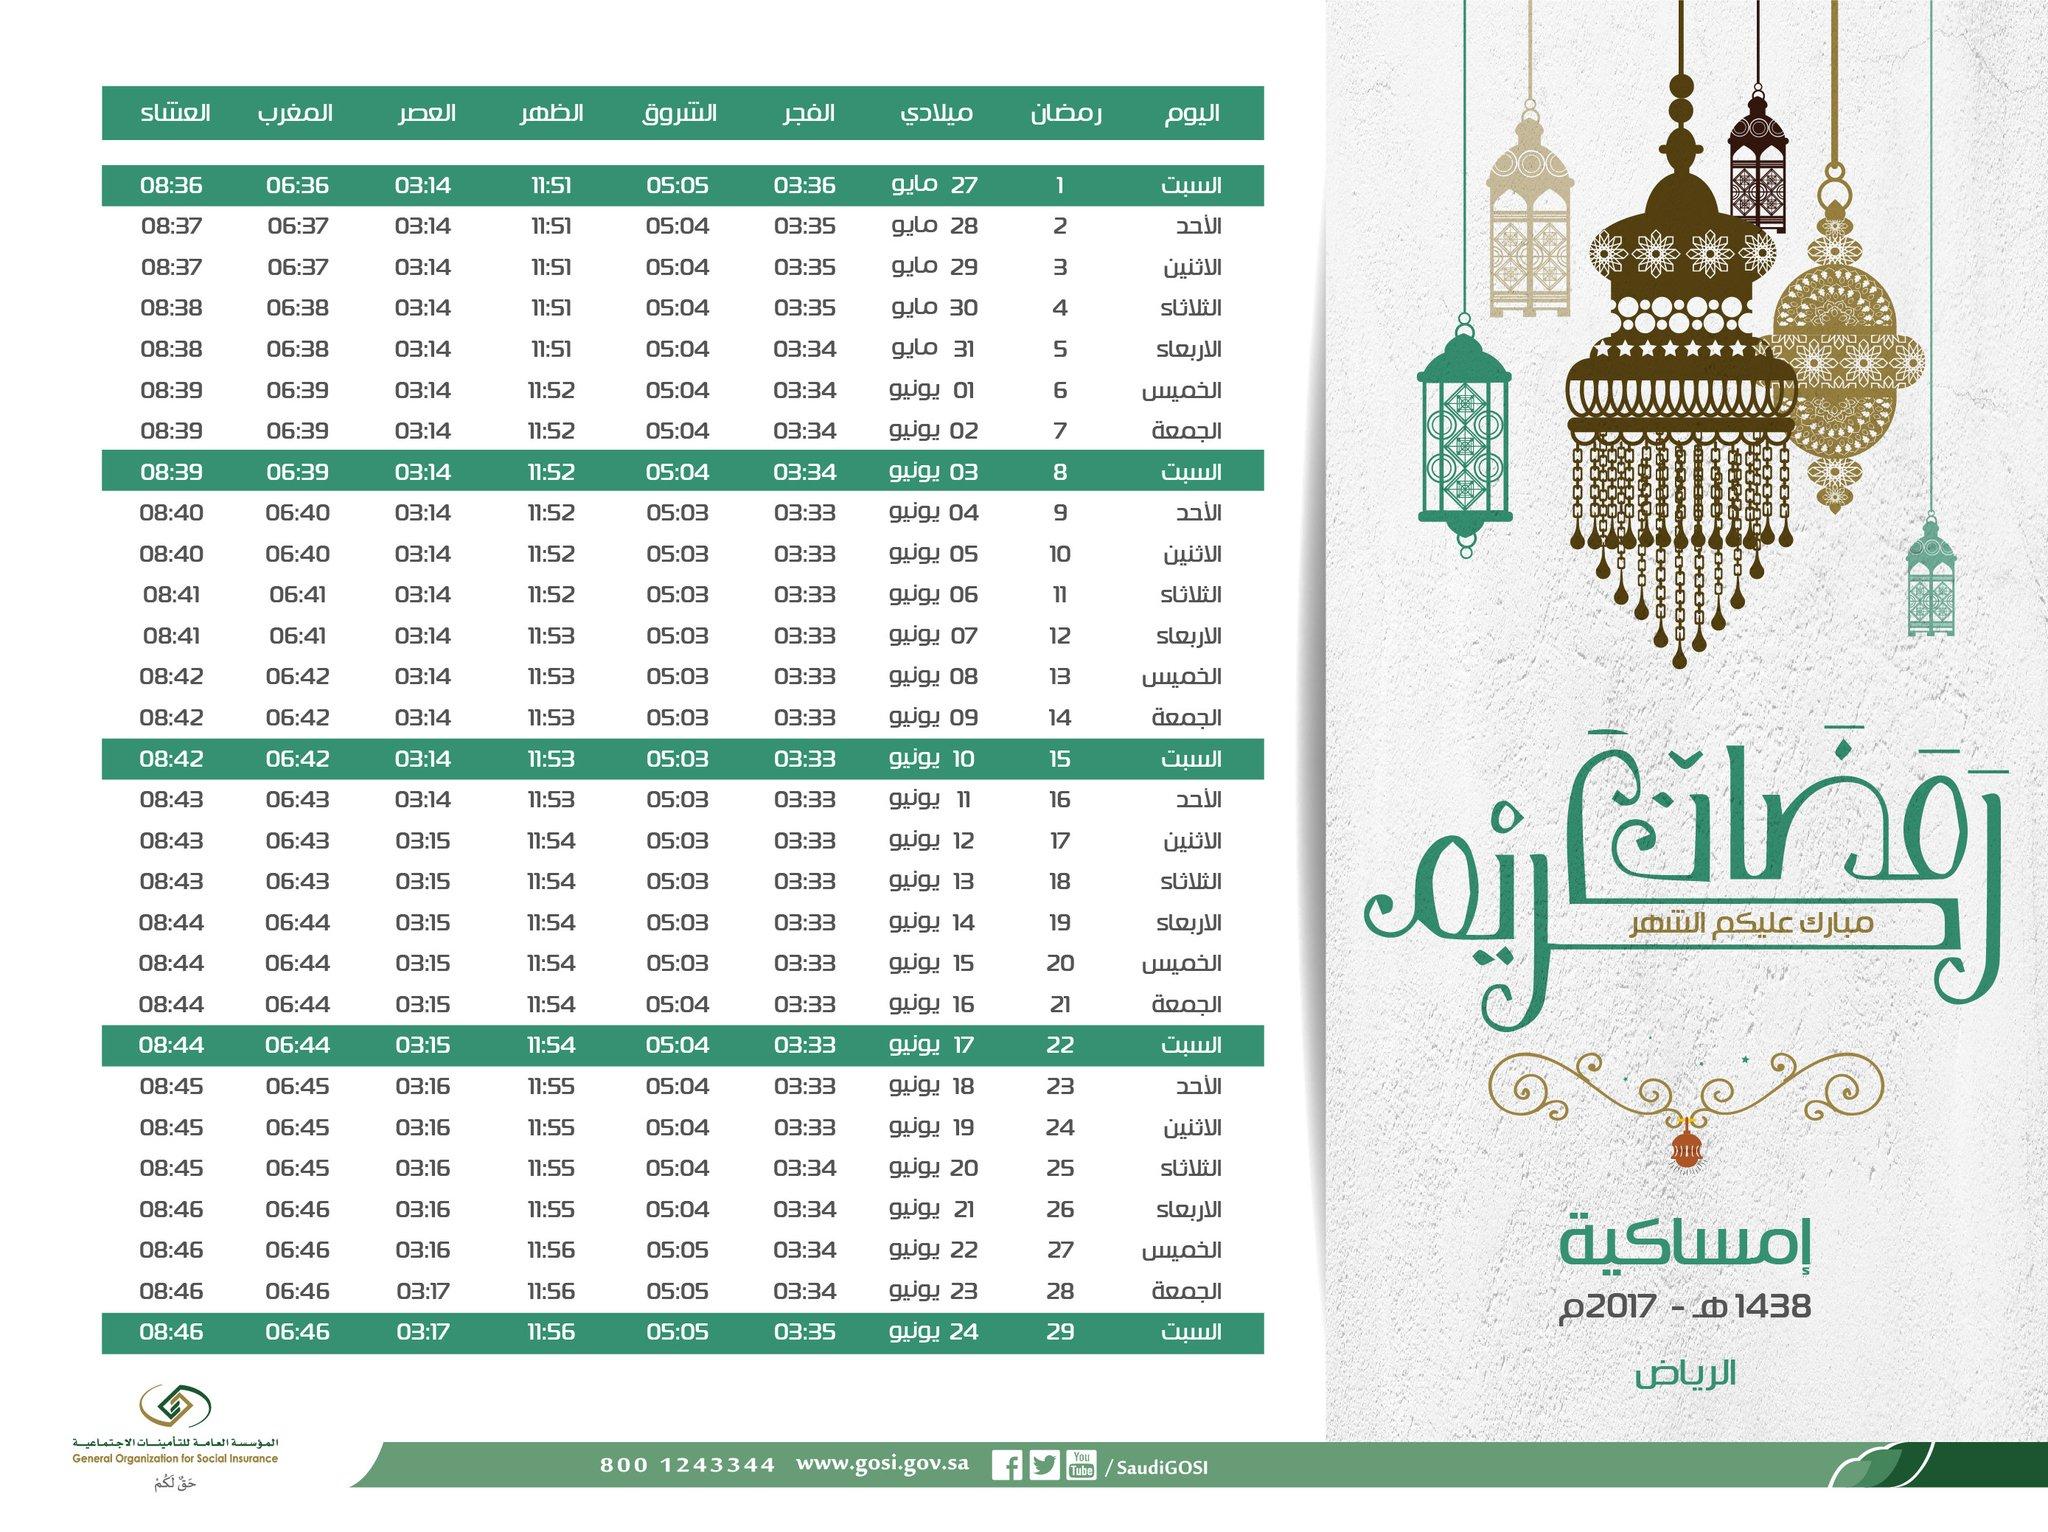 SaudiGOSI_2017-May-26 2.jpg